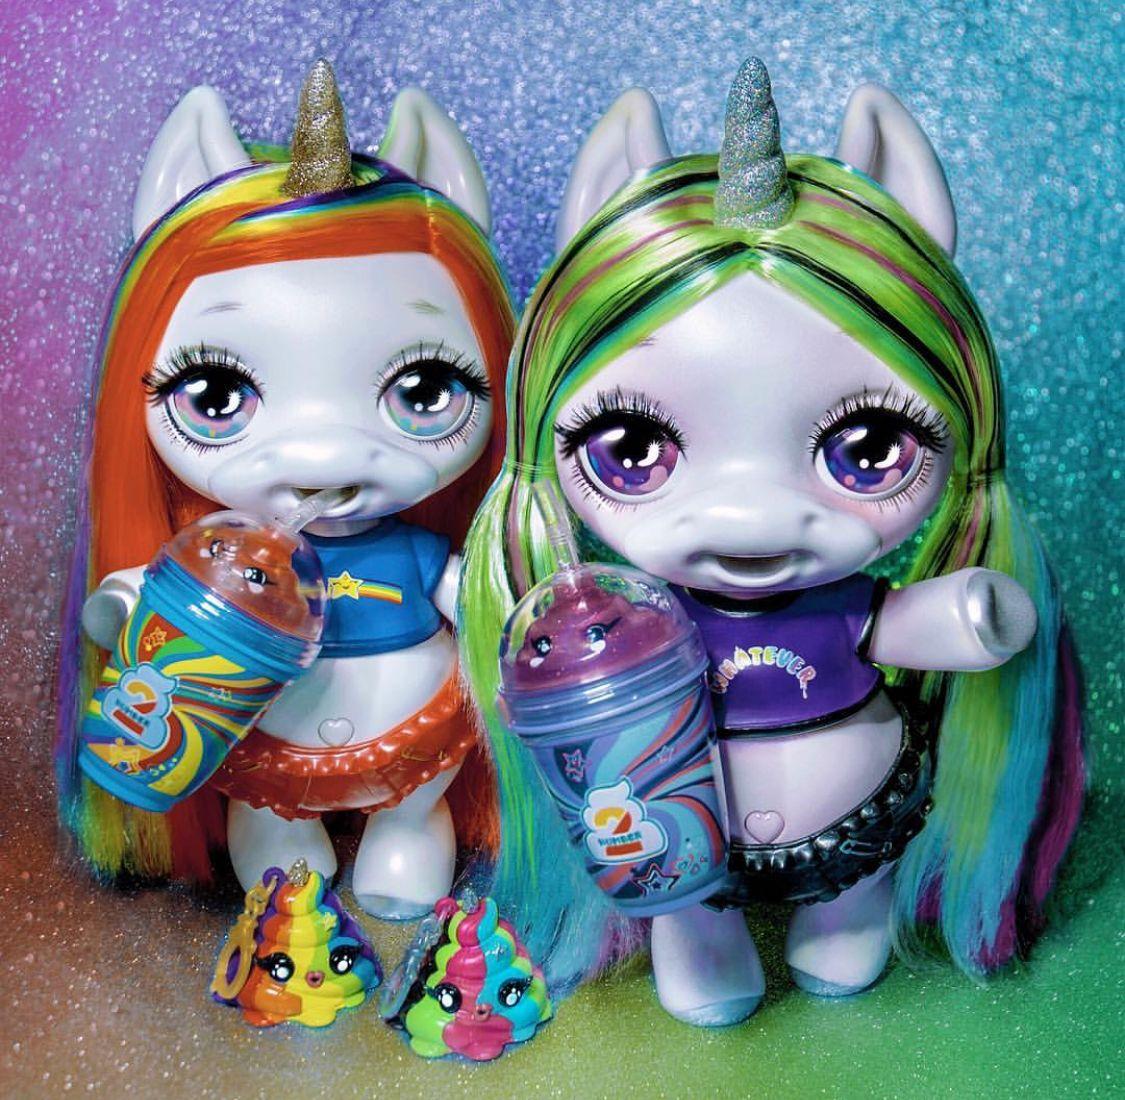 Rainbow Surprise Fantasy Friends Mini Doll LOL Spits Slime Glitter Poopsie NEW